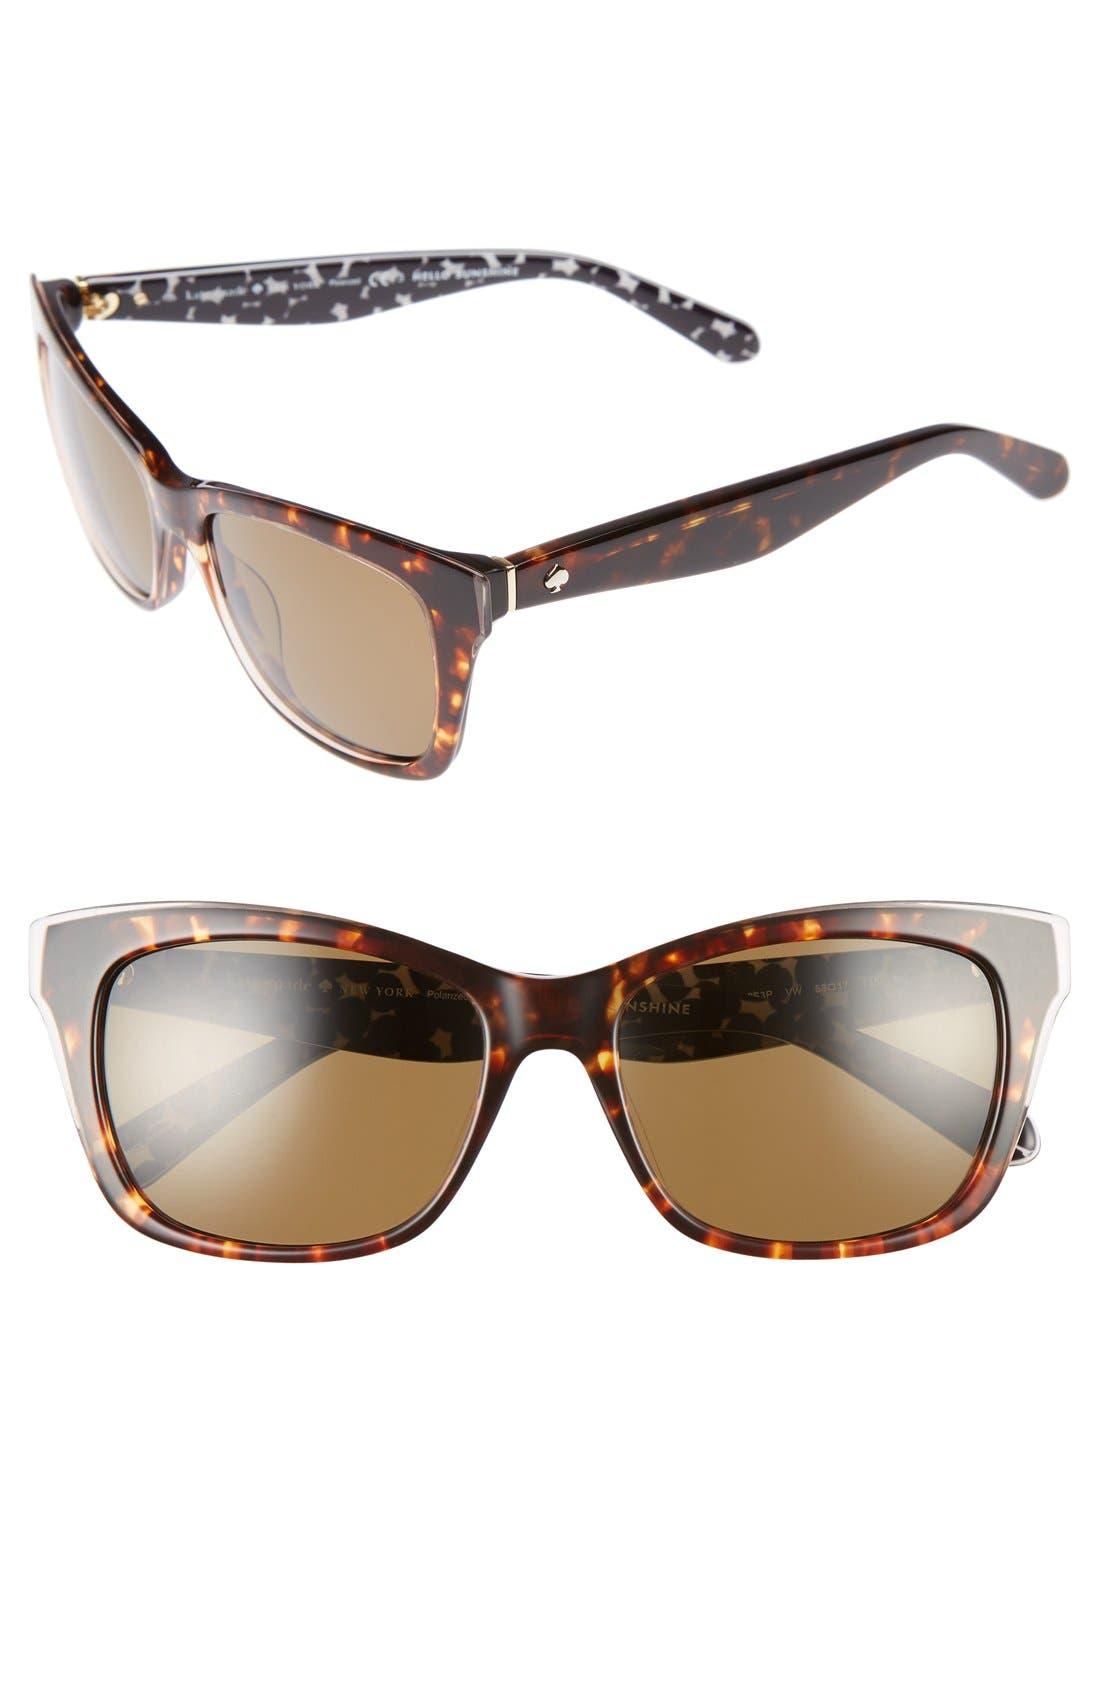 jenae 53mm polarized sunglasses,                             Main thumbnail 1, color,                             Havana/ Cream/ Transparent